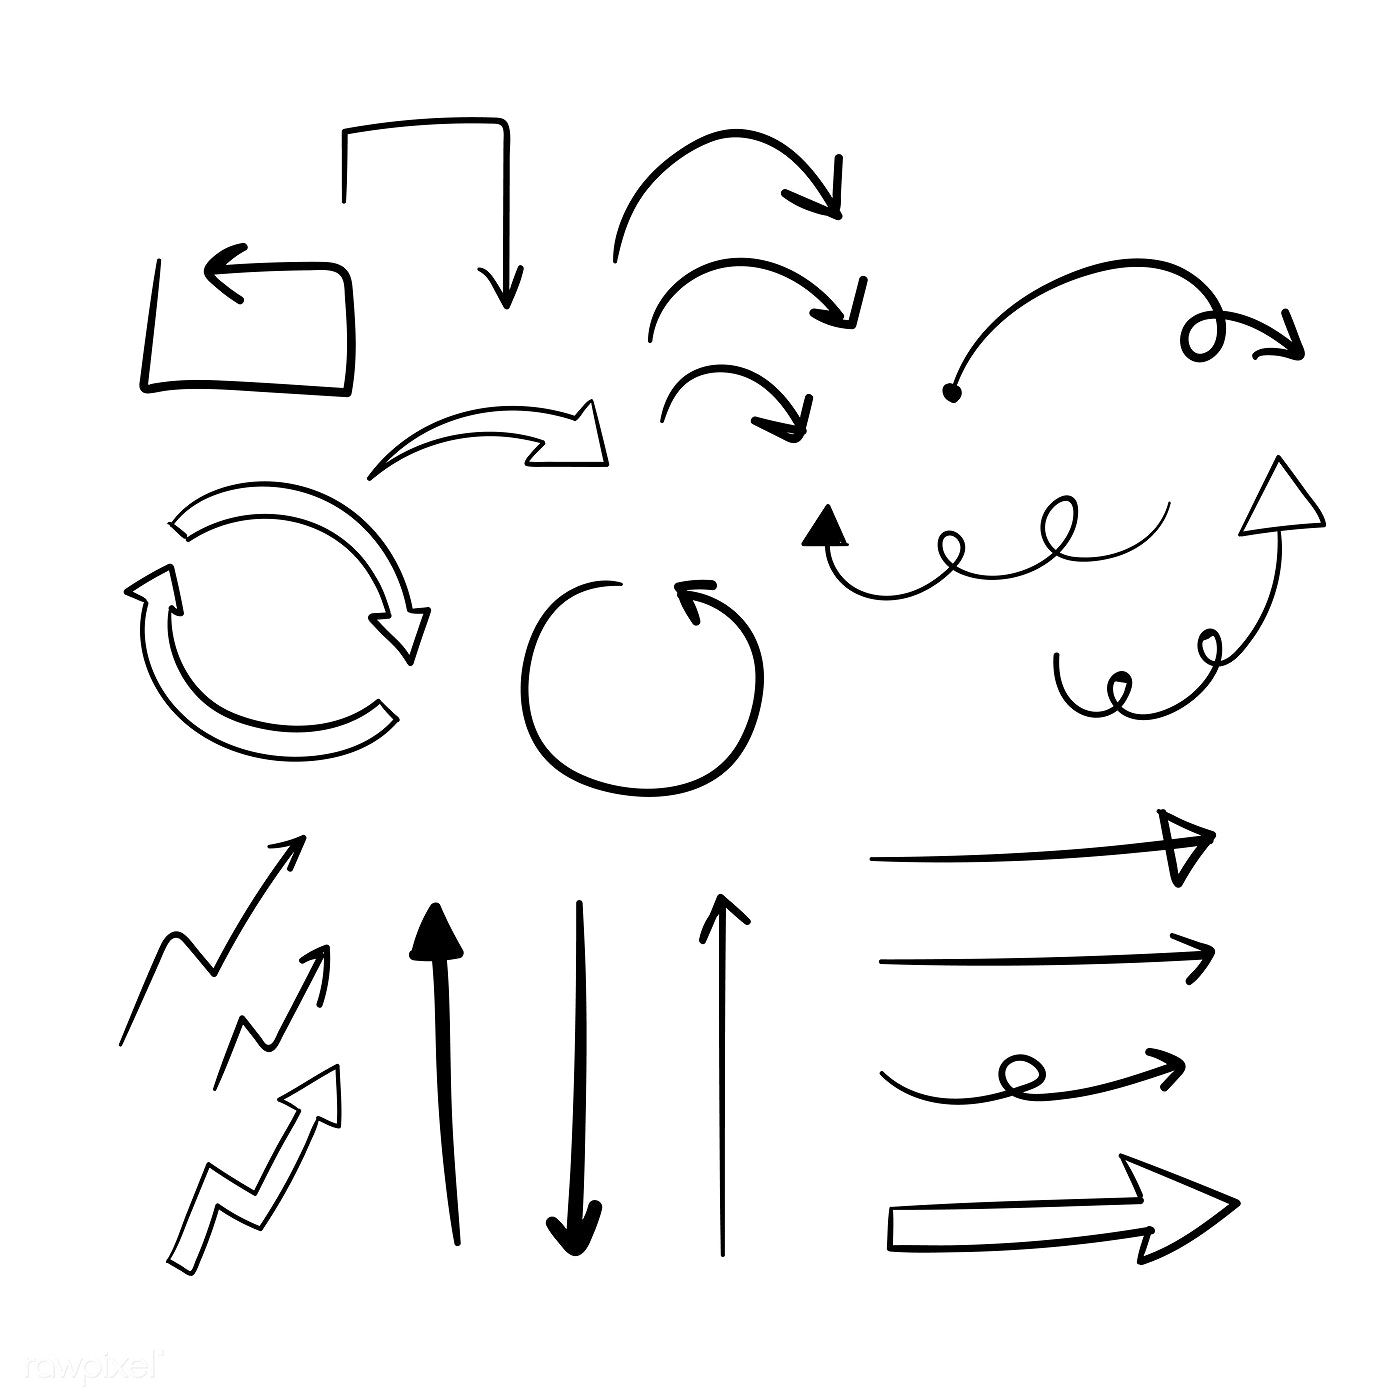 Hand Drawn Doodle Arrows Vector Set Free Image By Rawpixel Com Filmful Mapas Mentais Mapa